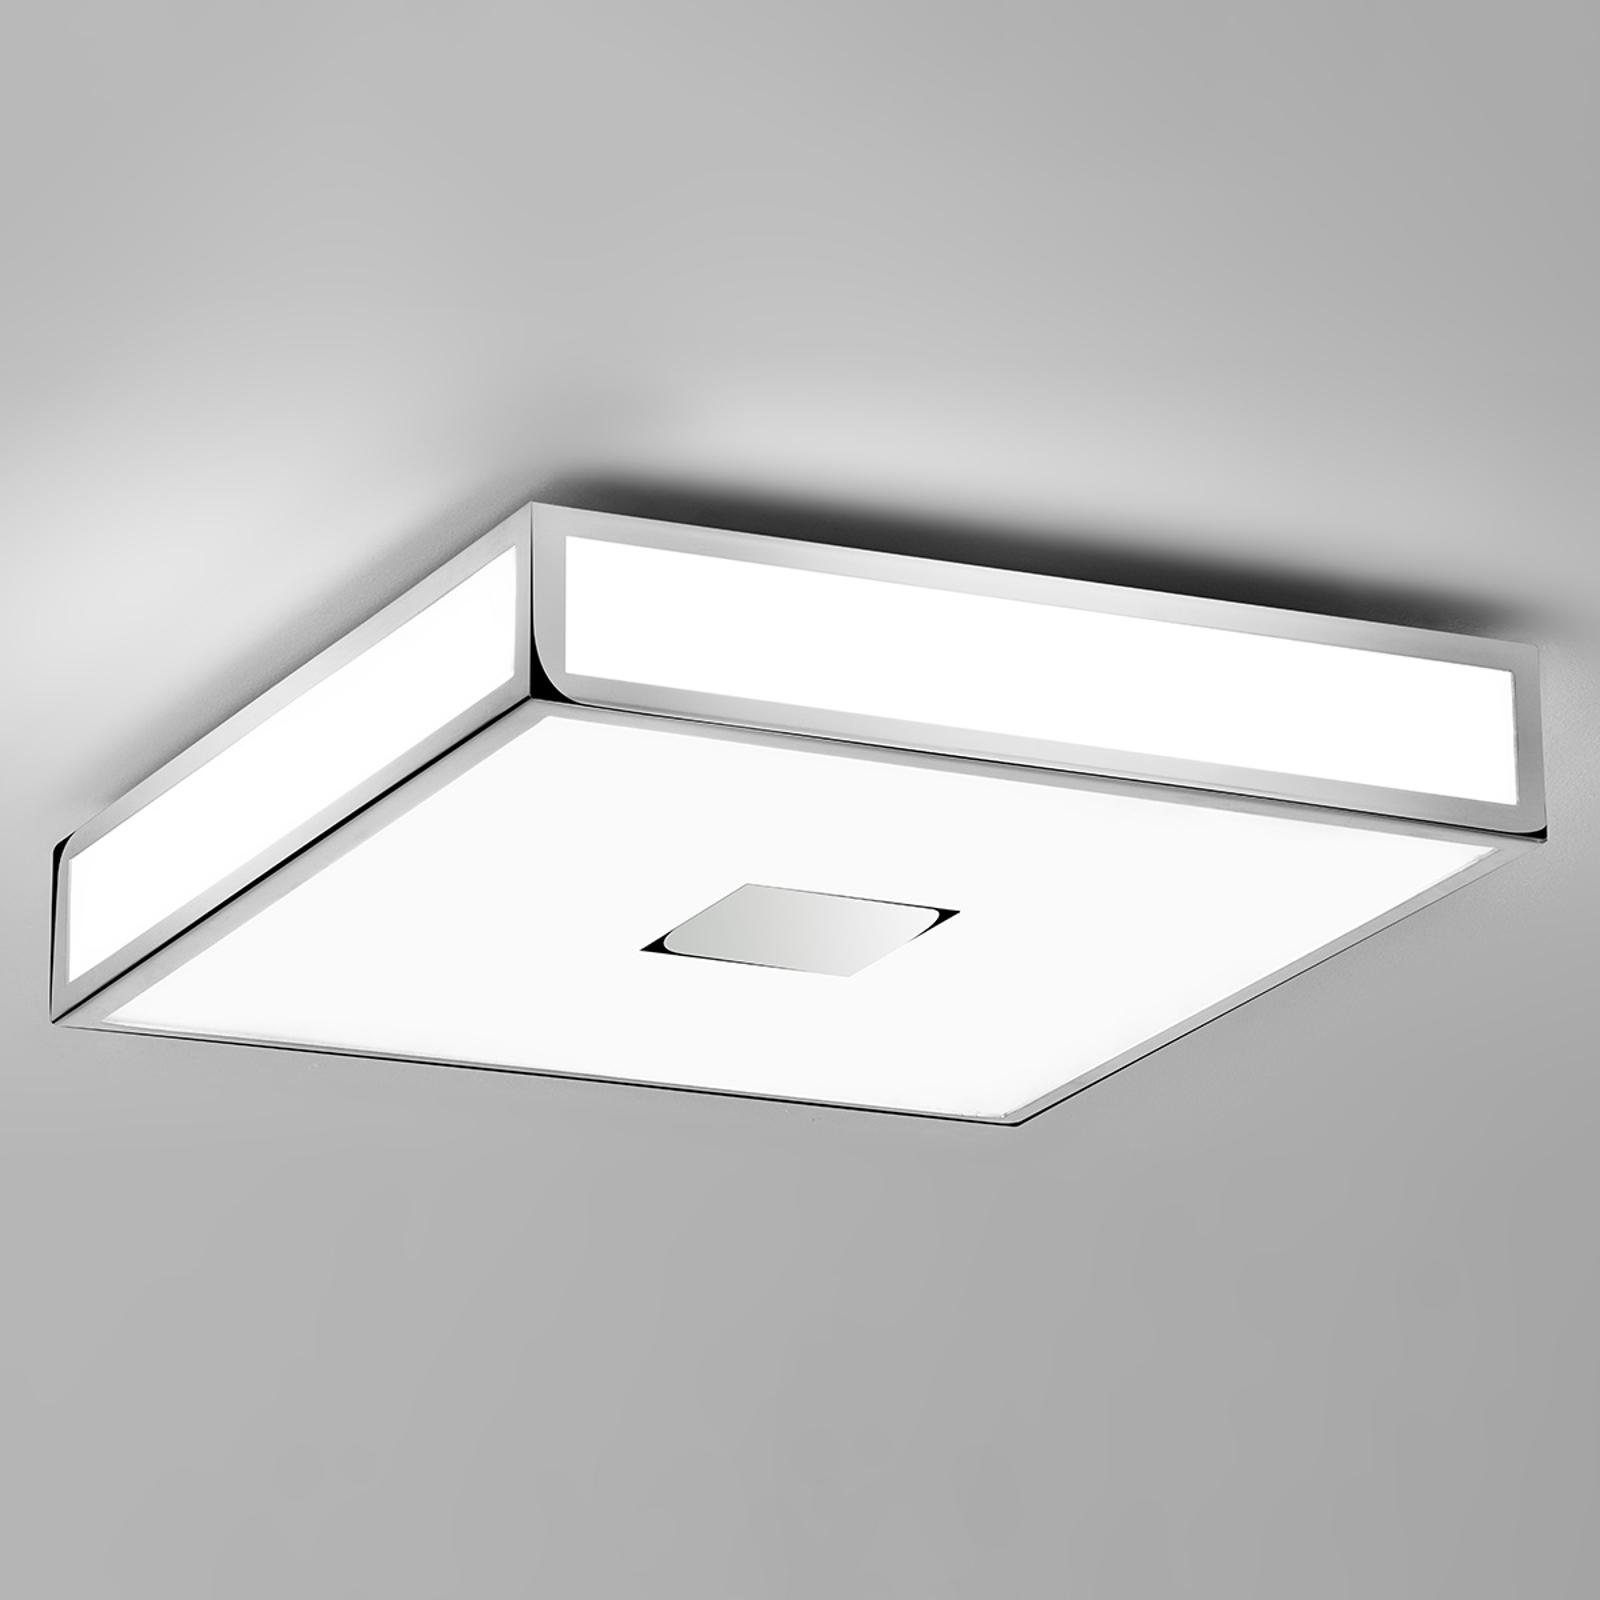 Mashiko Bathroom Ceiling Light Modern IP44 Chrome_1020301_1